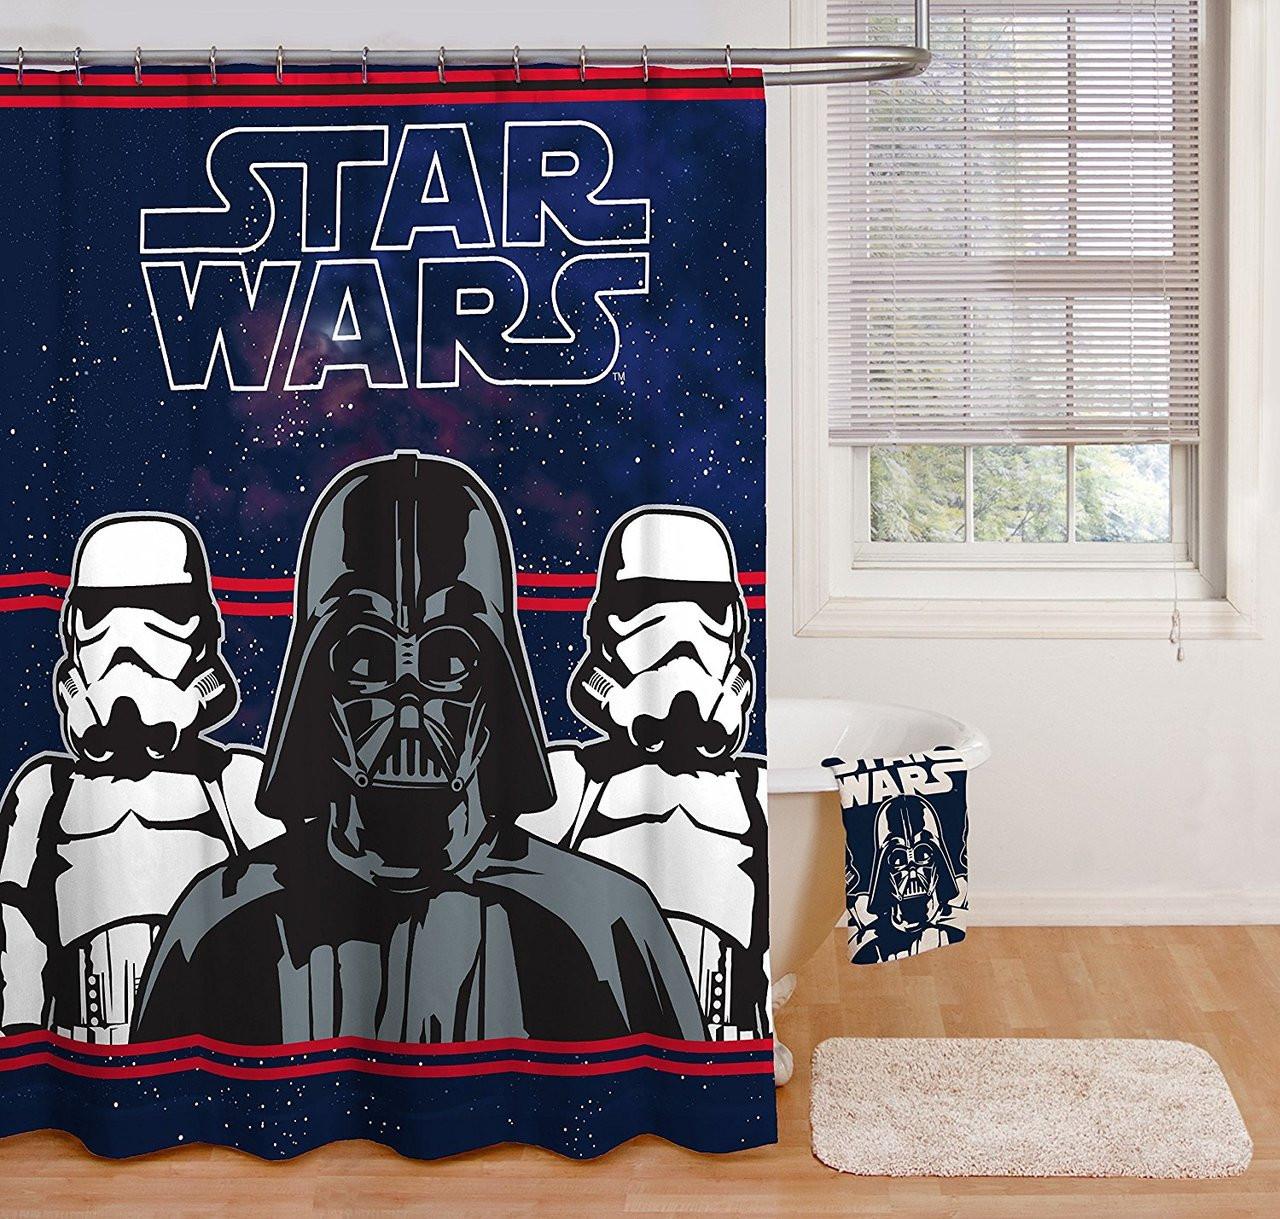 Star Wars Darth Vader Fabric Shower Curtain